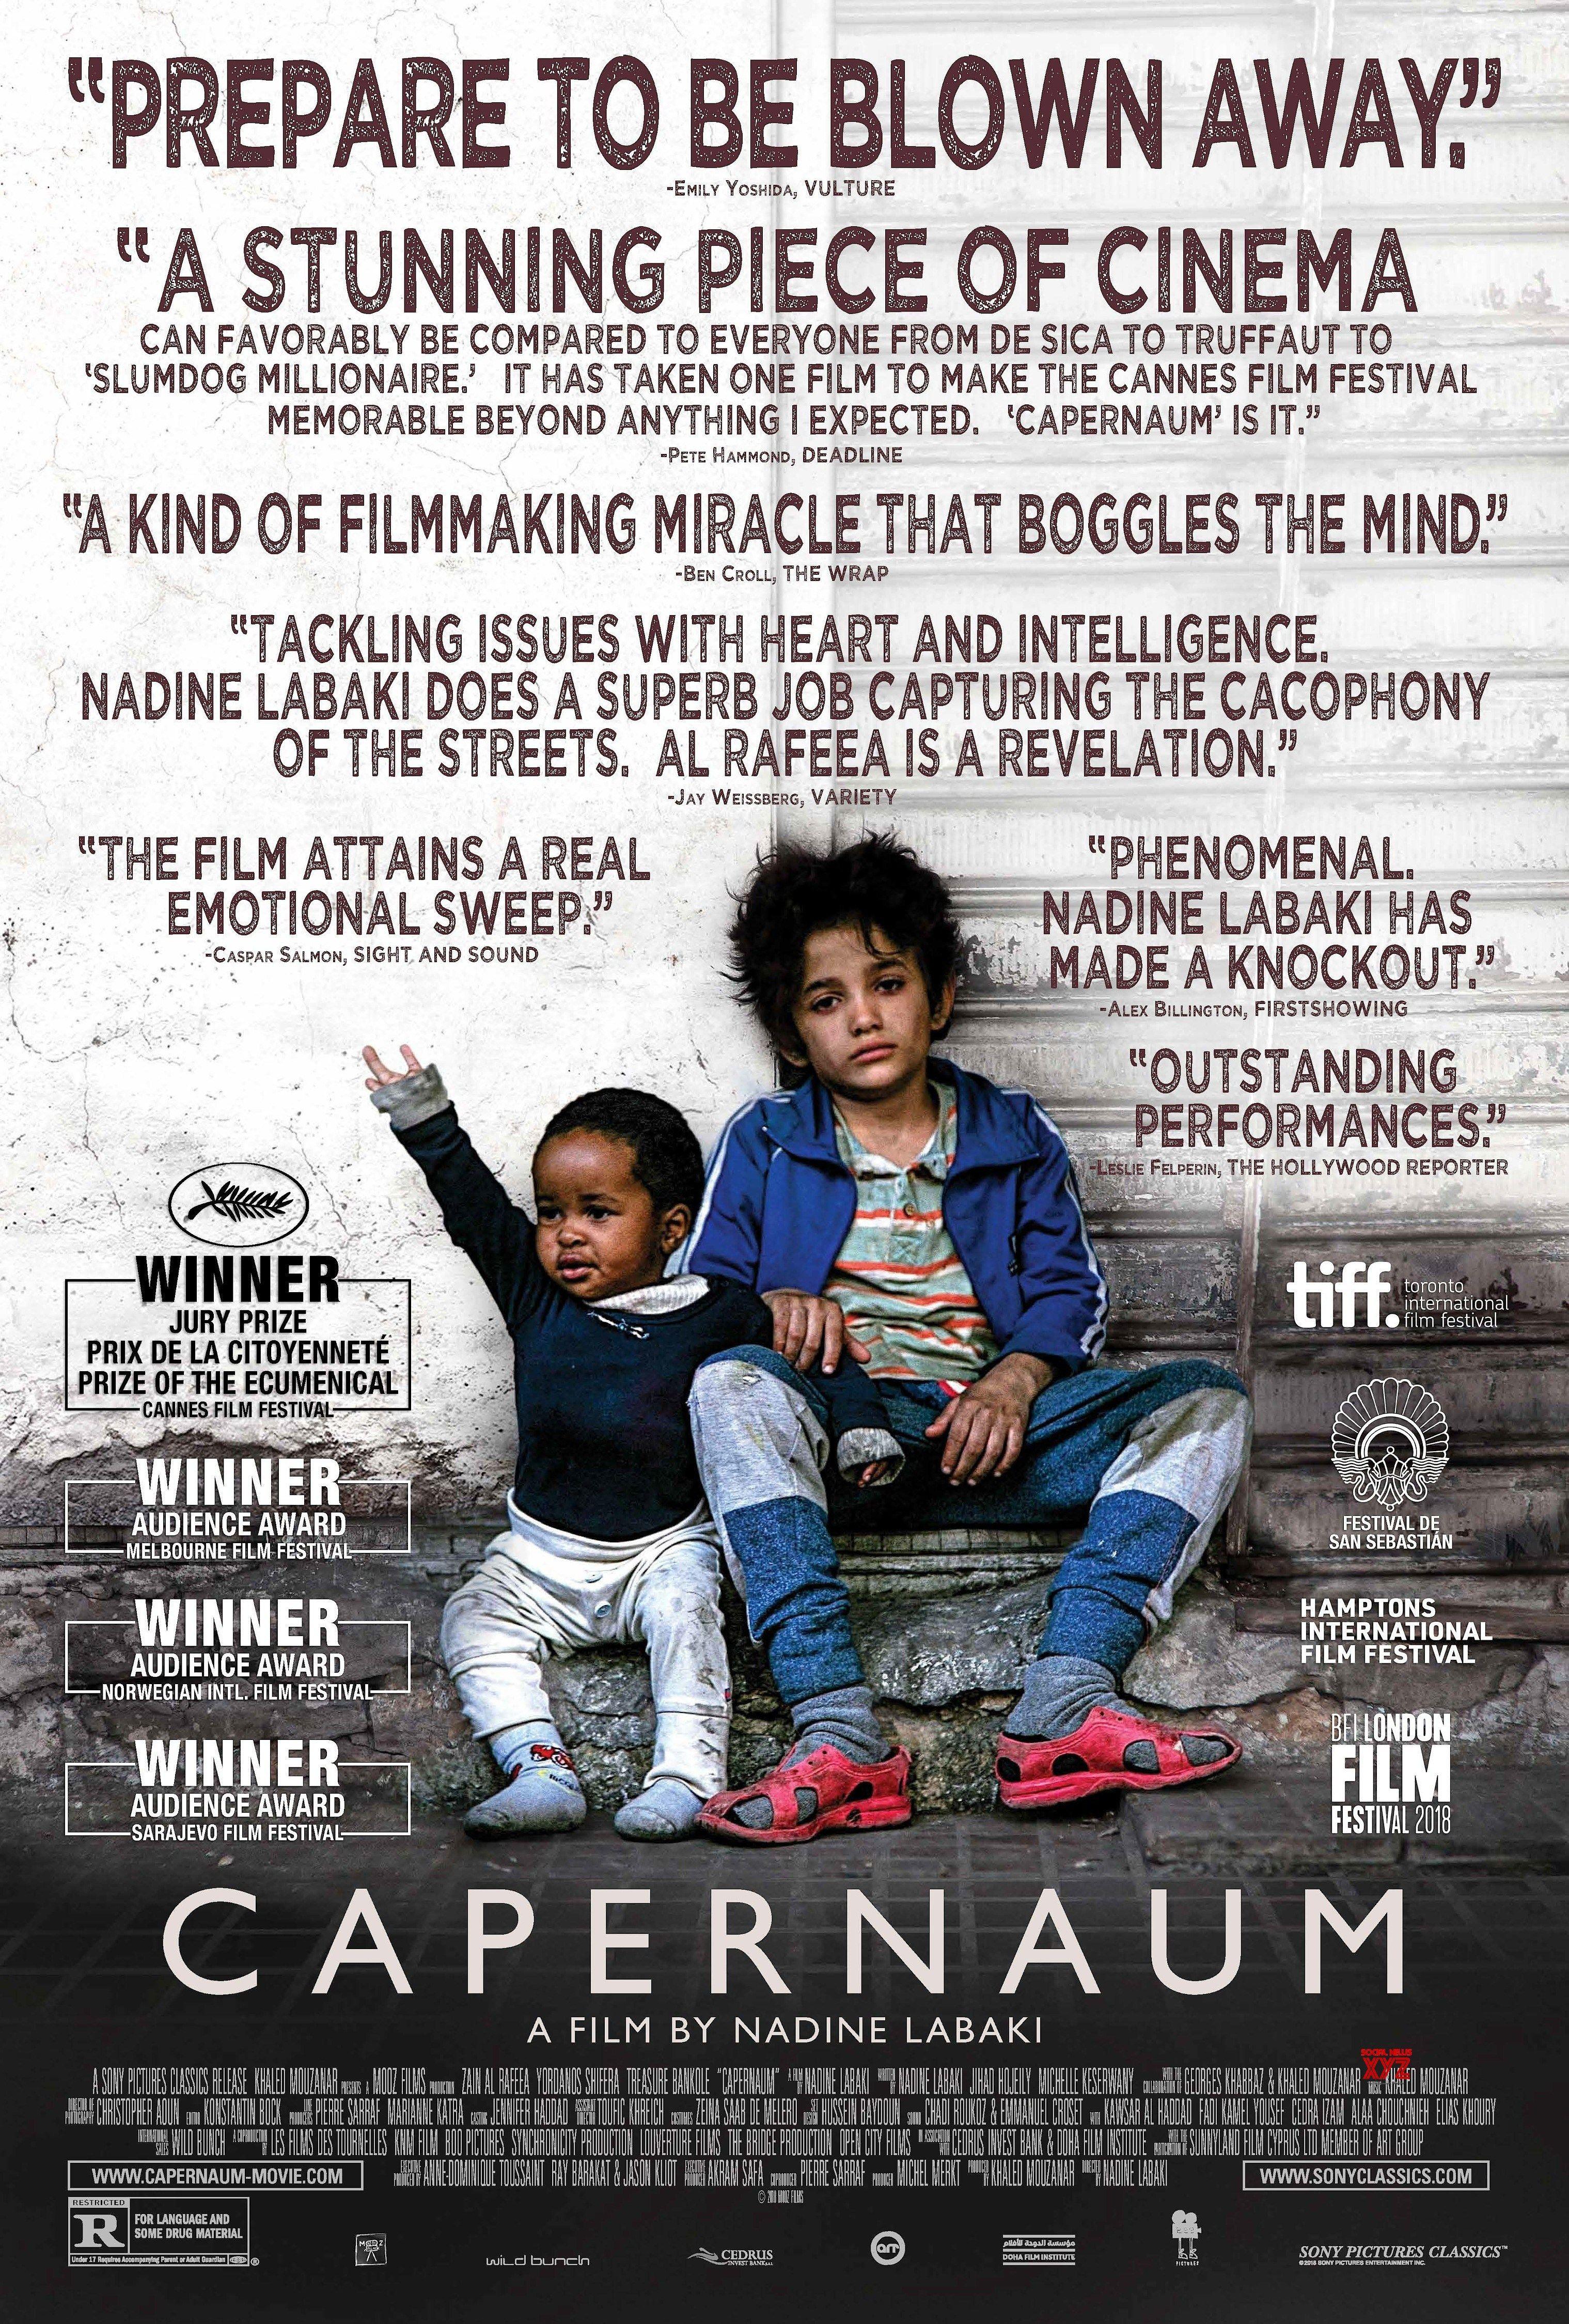 Capernaum Movie Hd Poster Filmes Antigos Hd 1080p 1080p